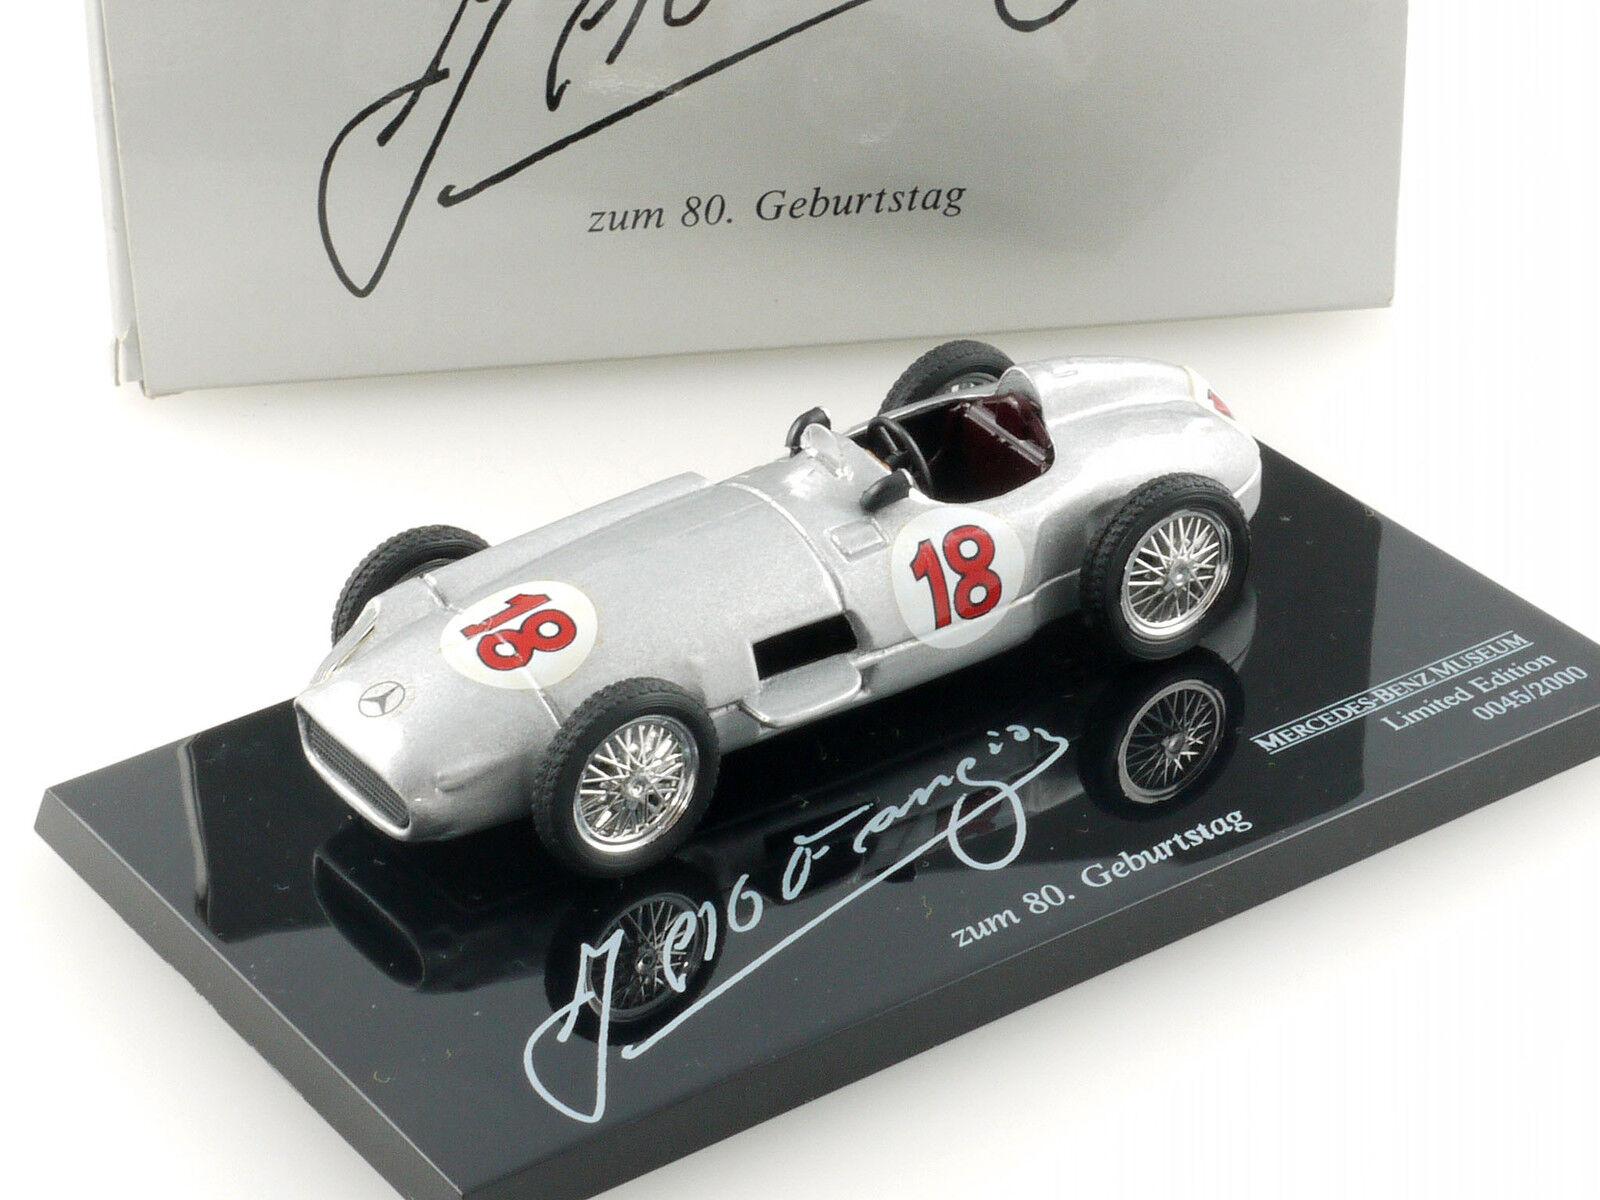 Brumm MERCEDES MB W 196 J.M. Fangio al 80. COMPLEANNO stata limitata OVP 1411-14-33